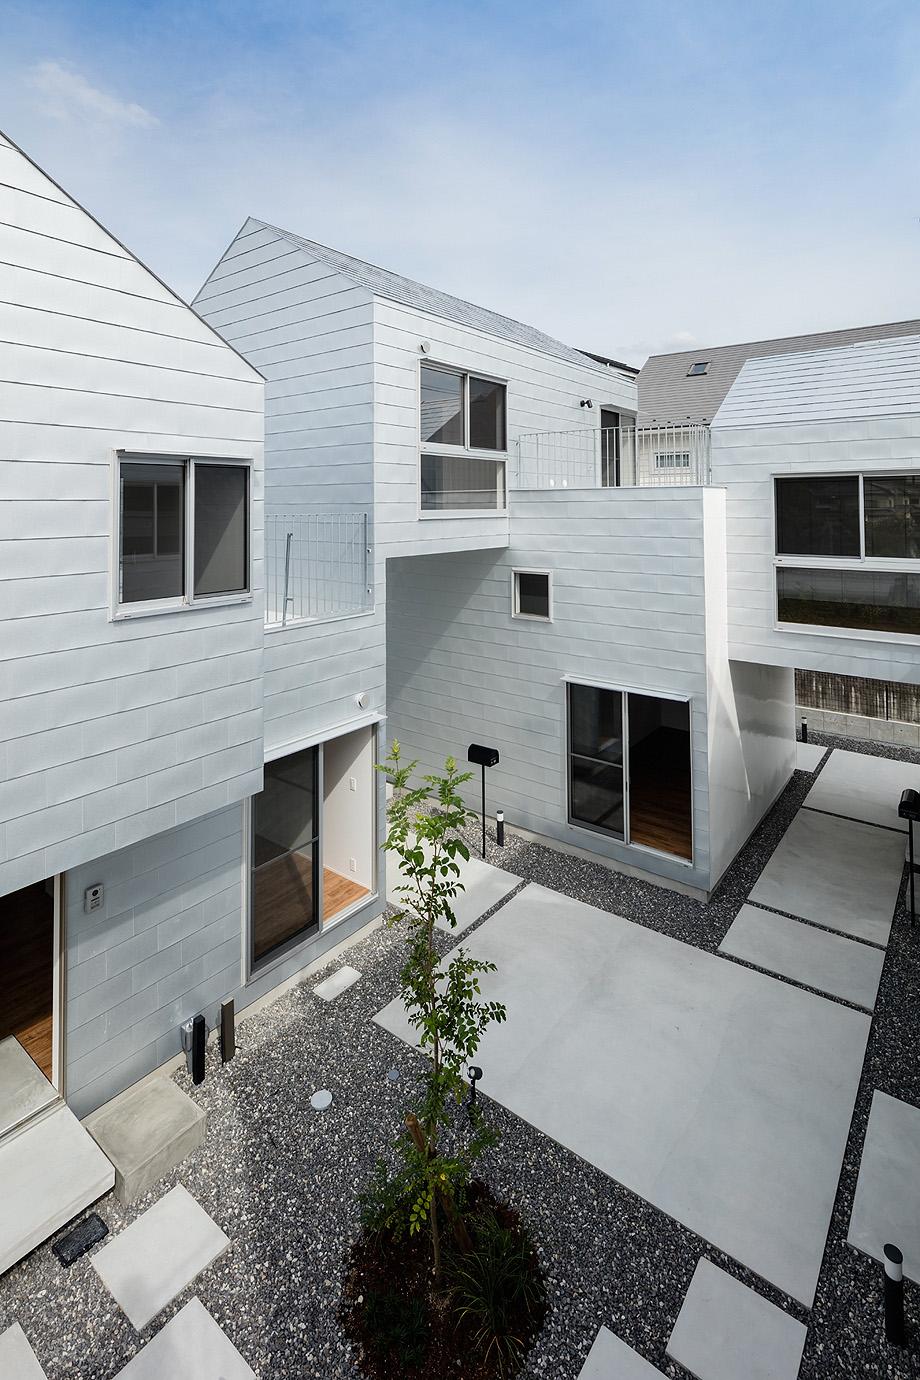 apartamentos de alquiler de masahiko fujimori - foto shigeo owaga (4)